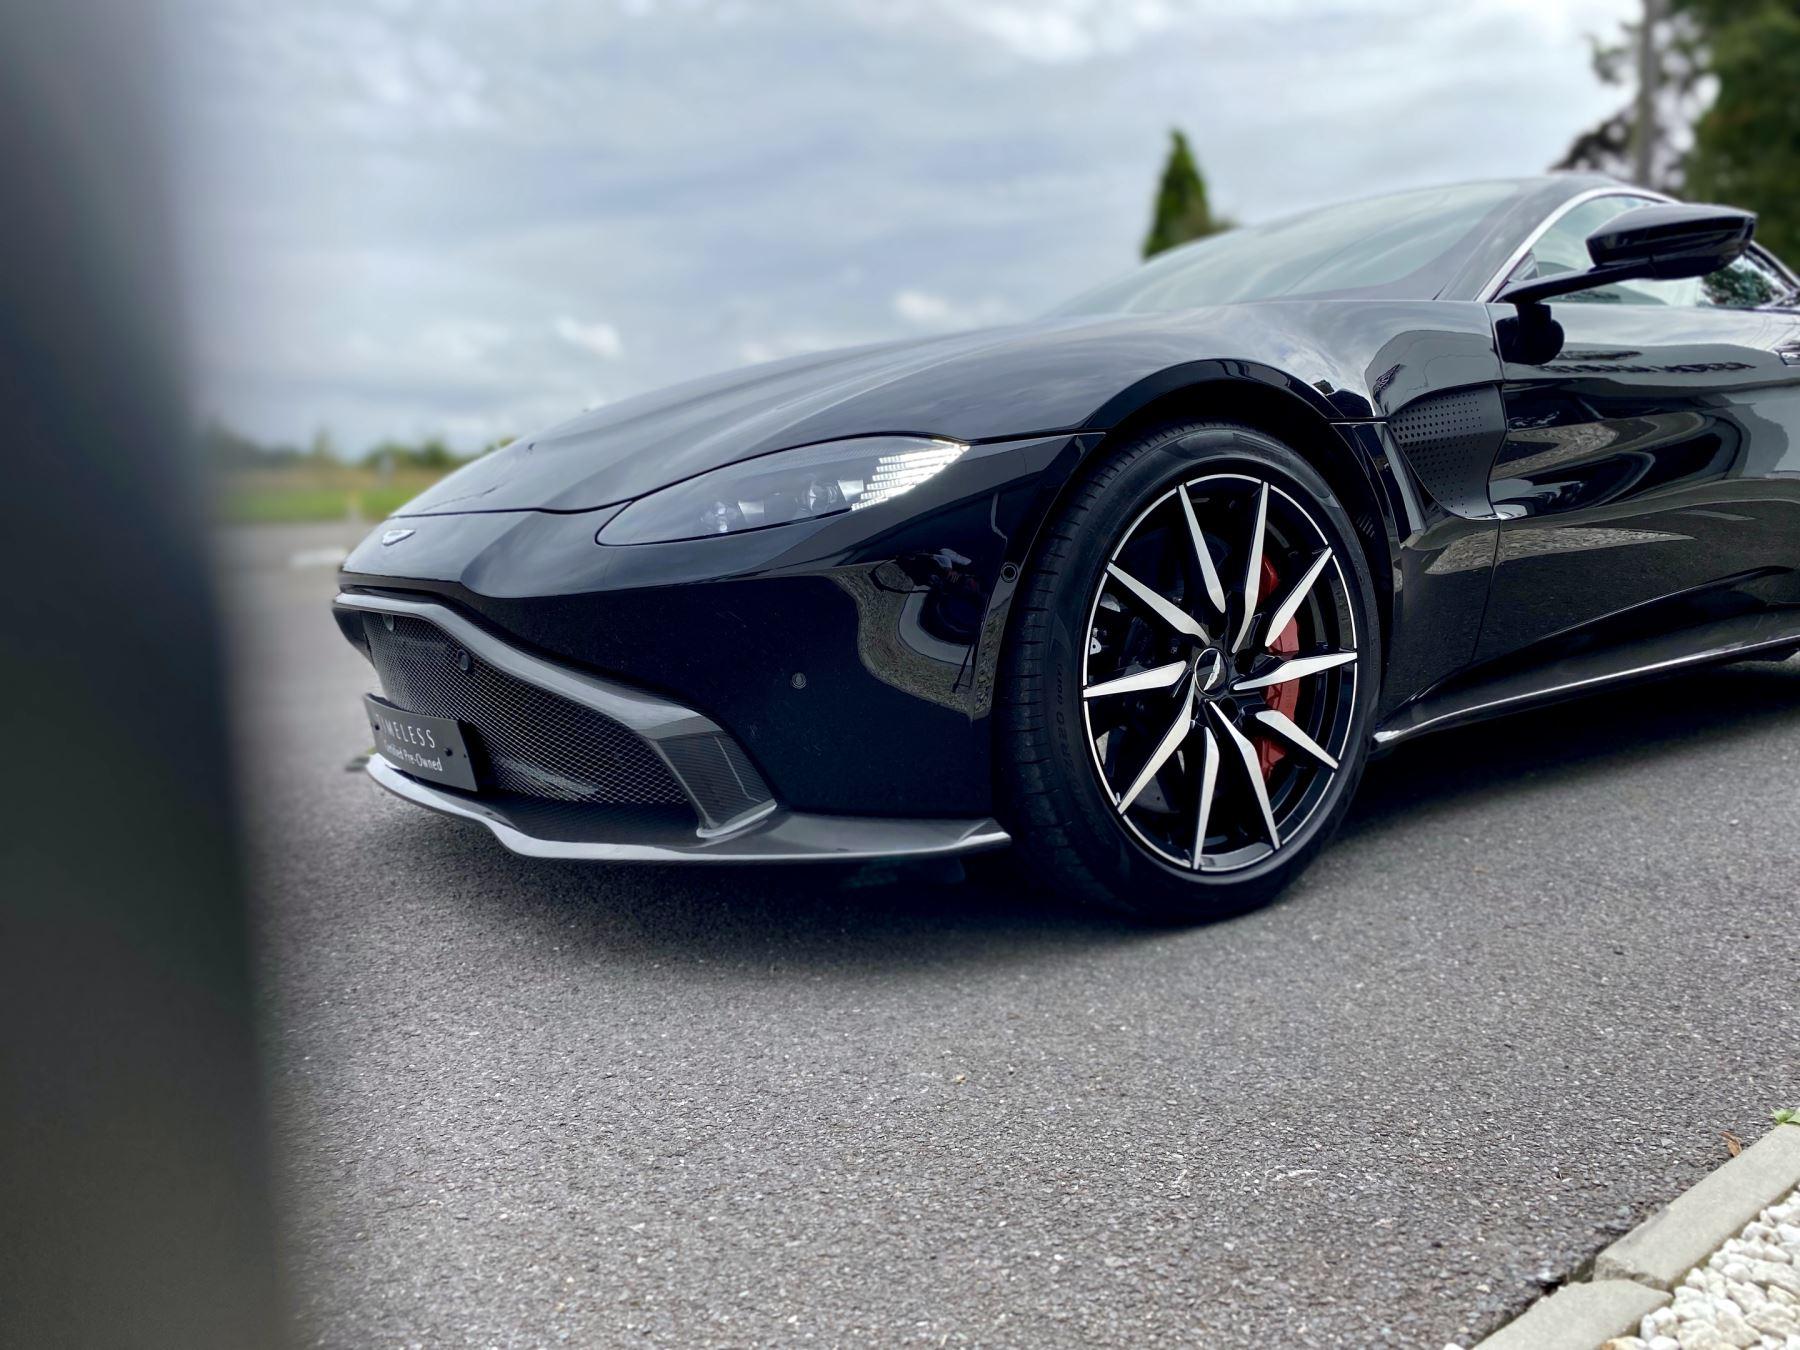 Aston Martin New Vantage 2dr ZF 8 Speed Auto. 4.0 Twin Turbo ZF Gearbox  Reversing Camera Heated Seats Ceramic Brakes image 21